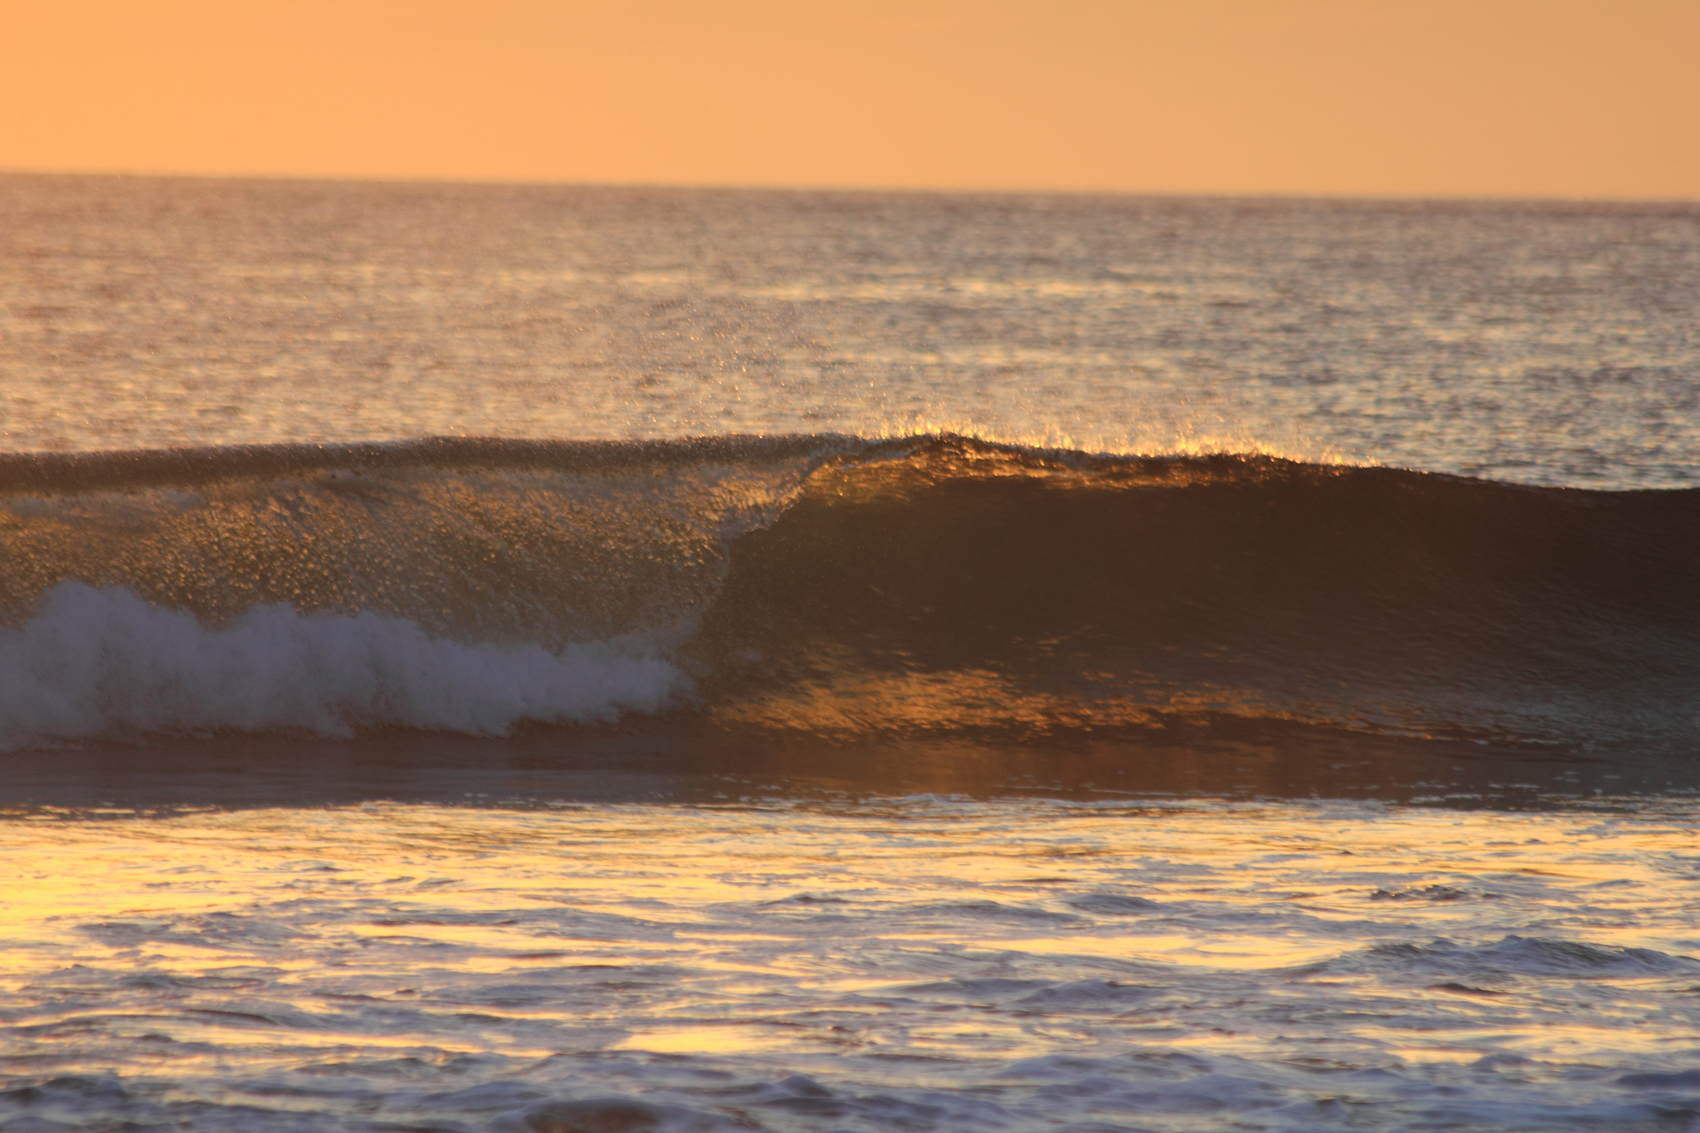 costa-rica-surfing4